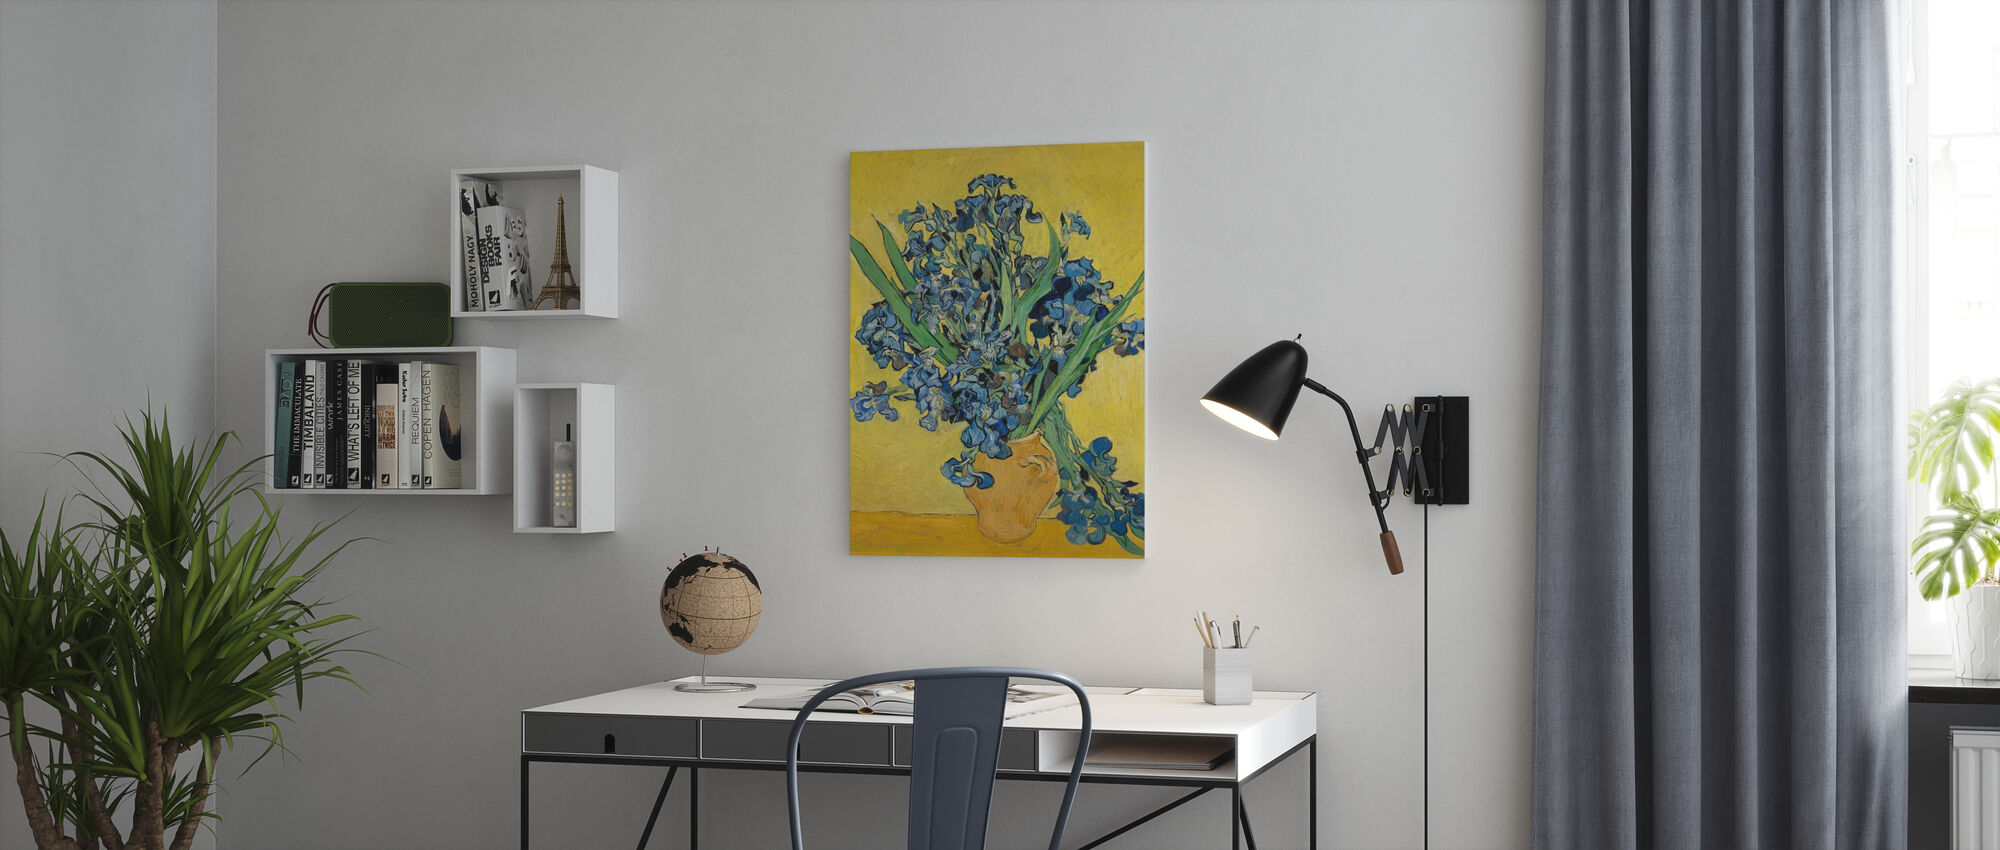 Iris - Vincent Van Gogh - Canvastavla - Kontor